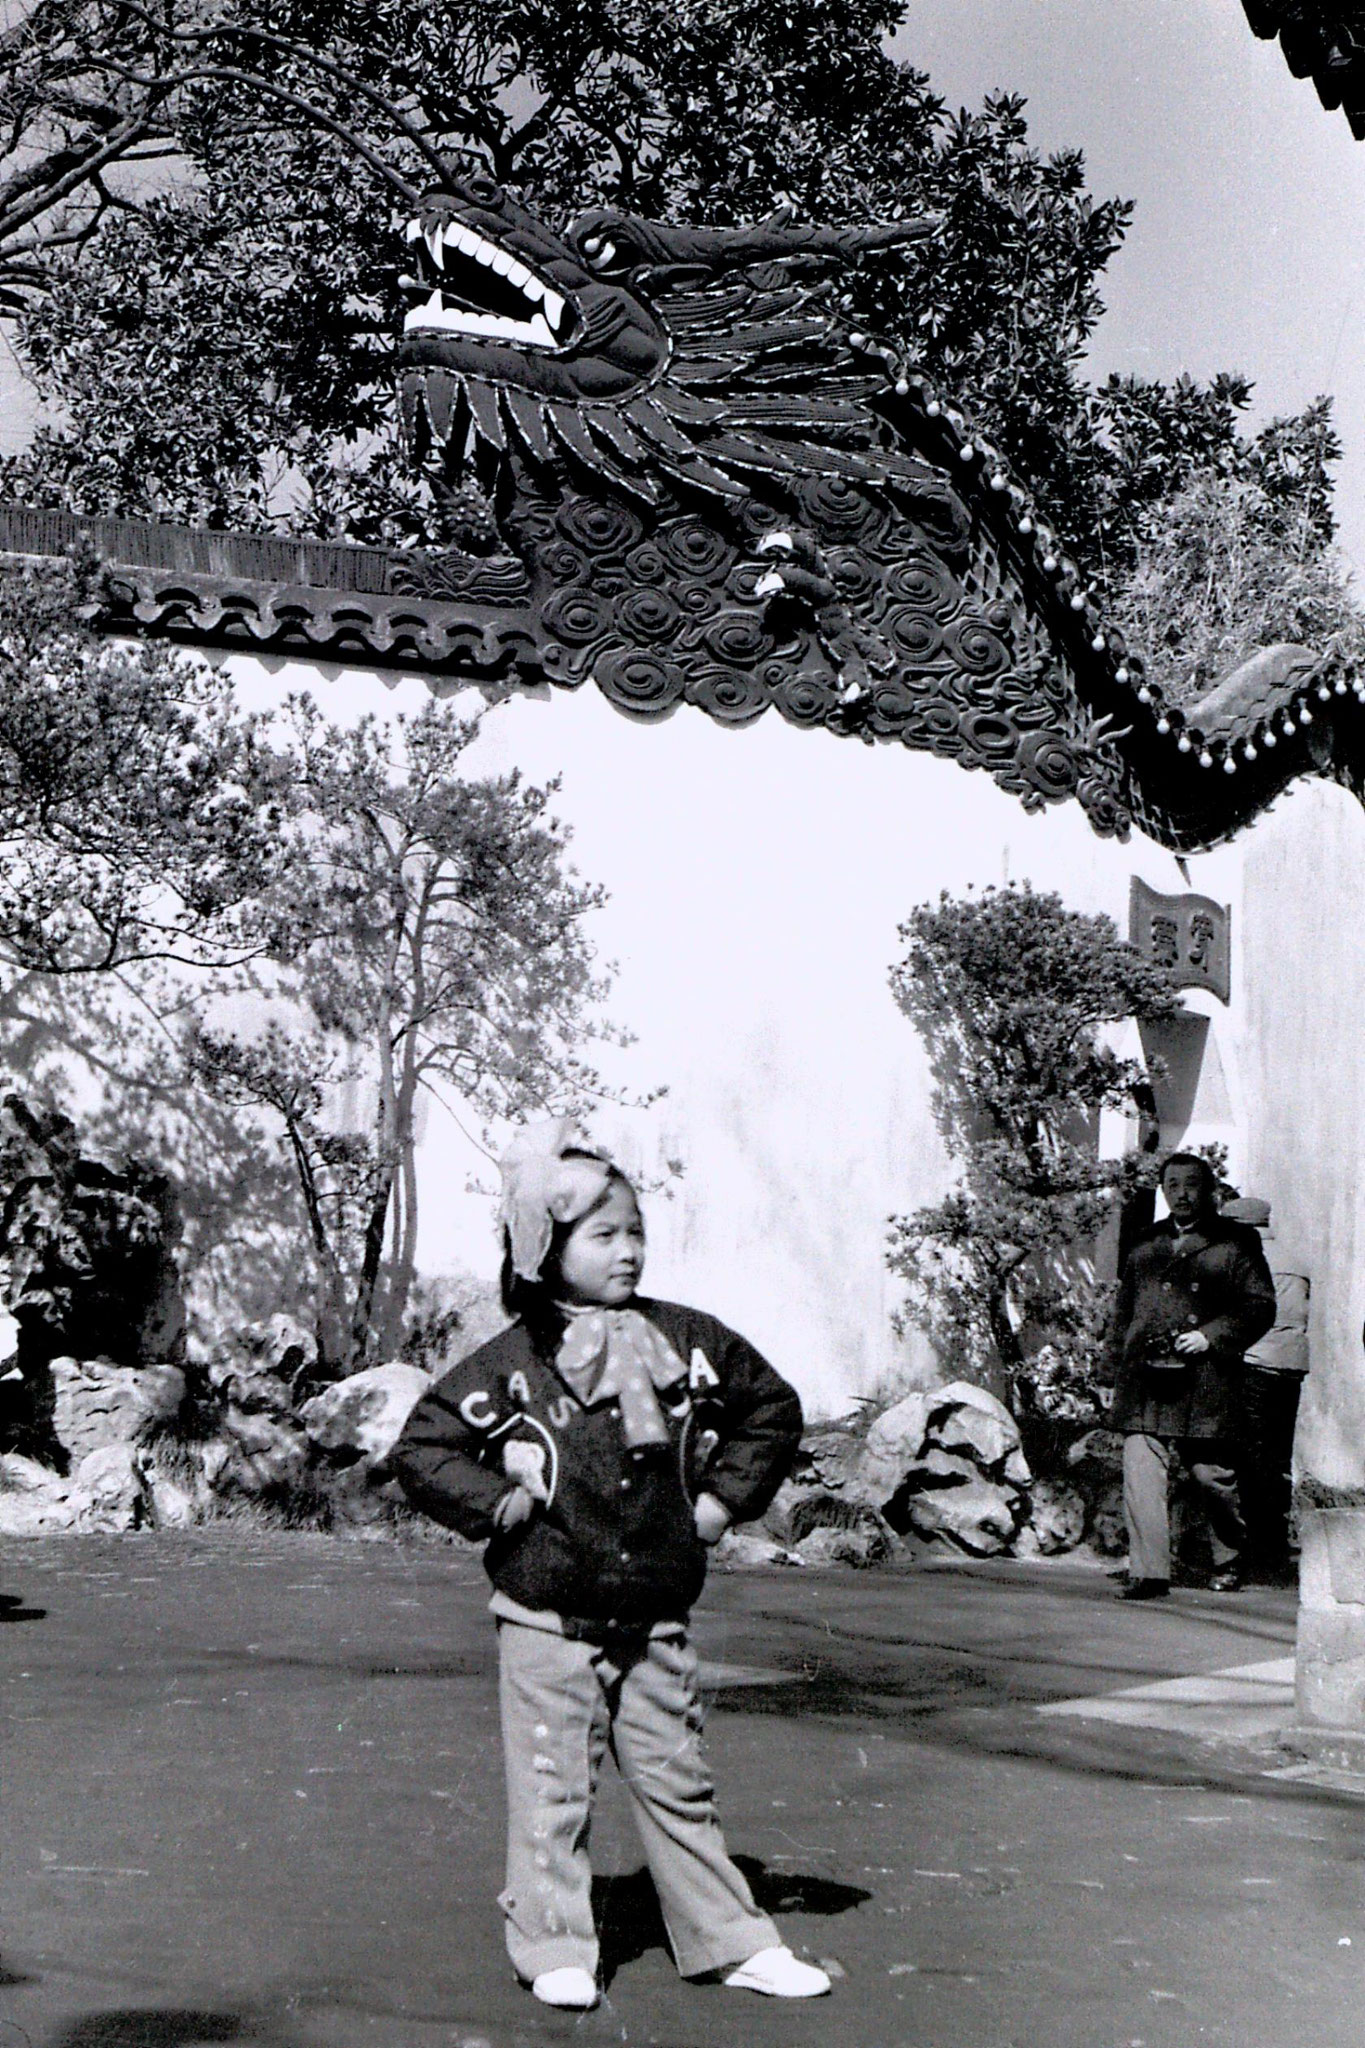 10/2/1989: 3: Shanghai Yuyuan Gardens